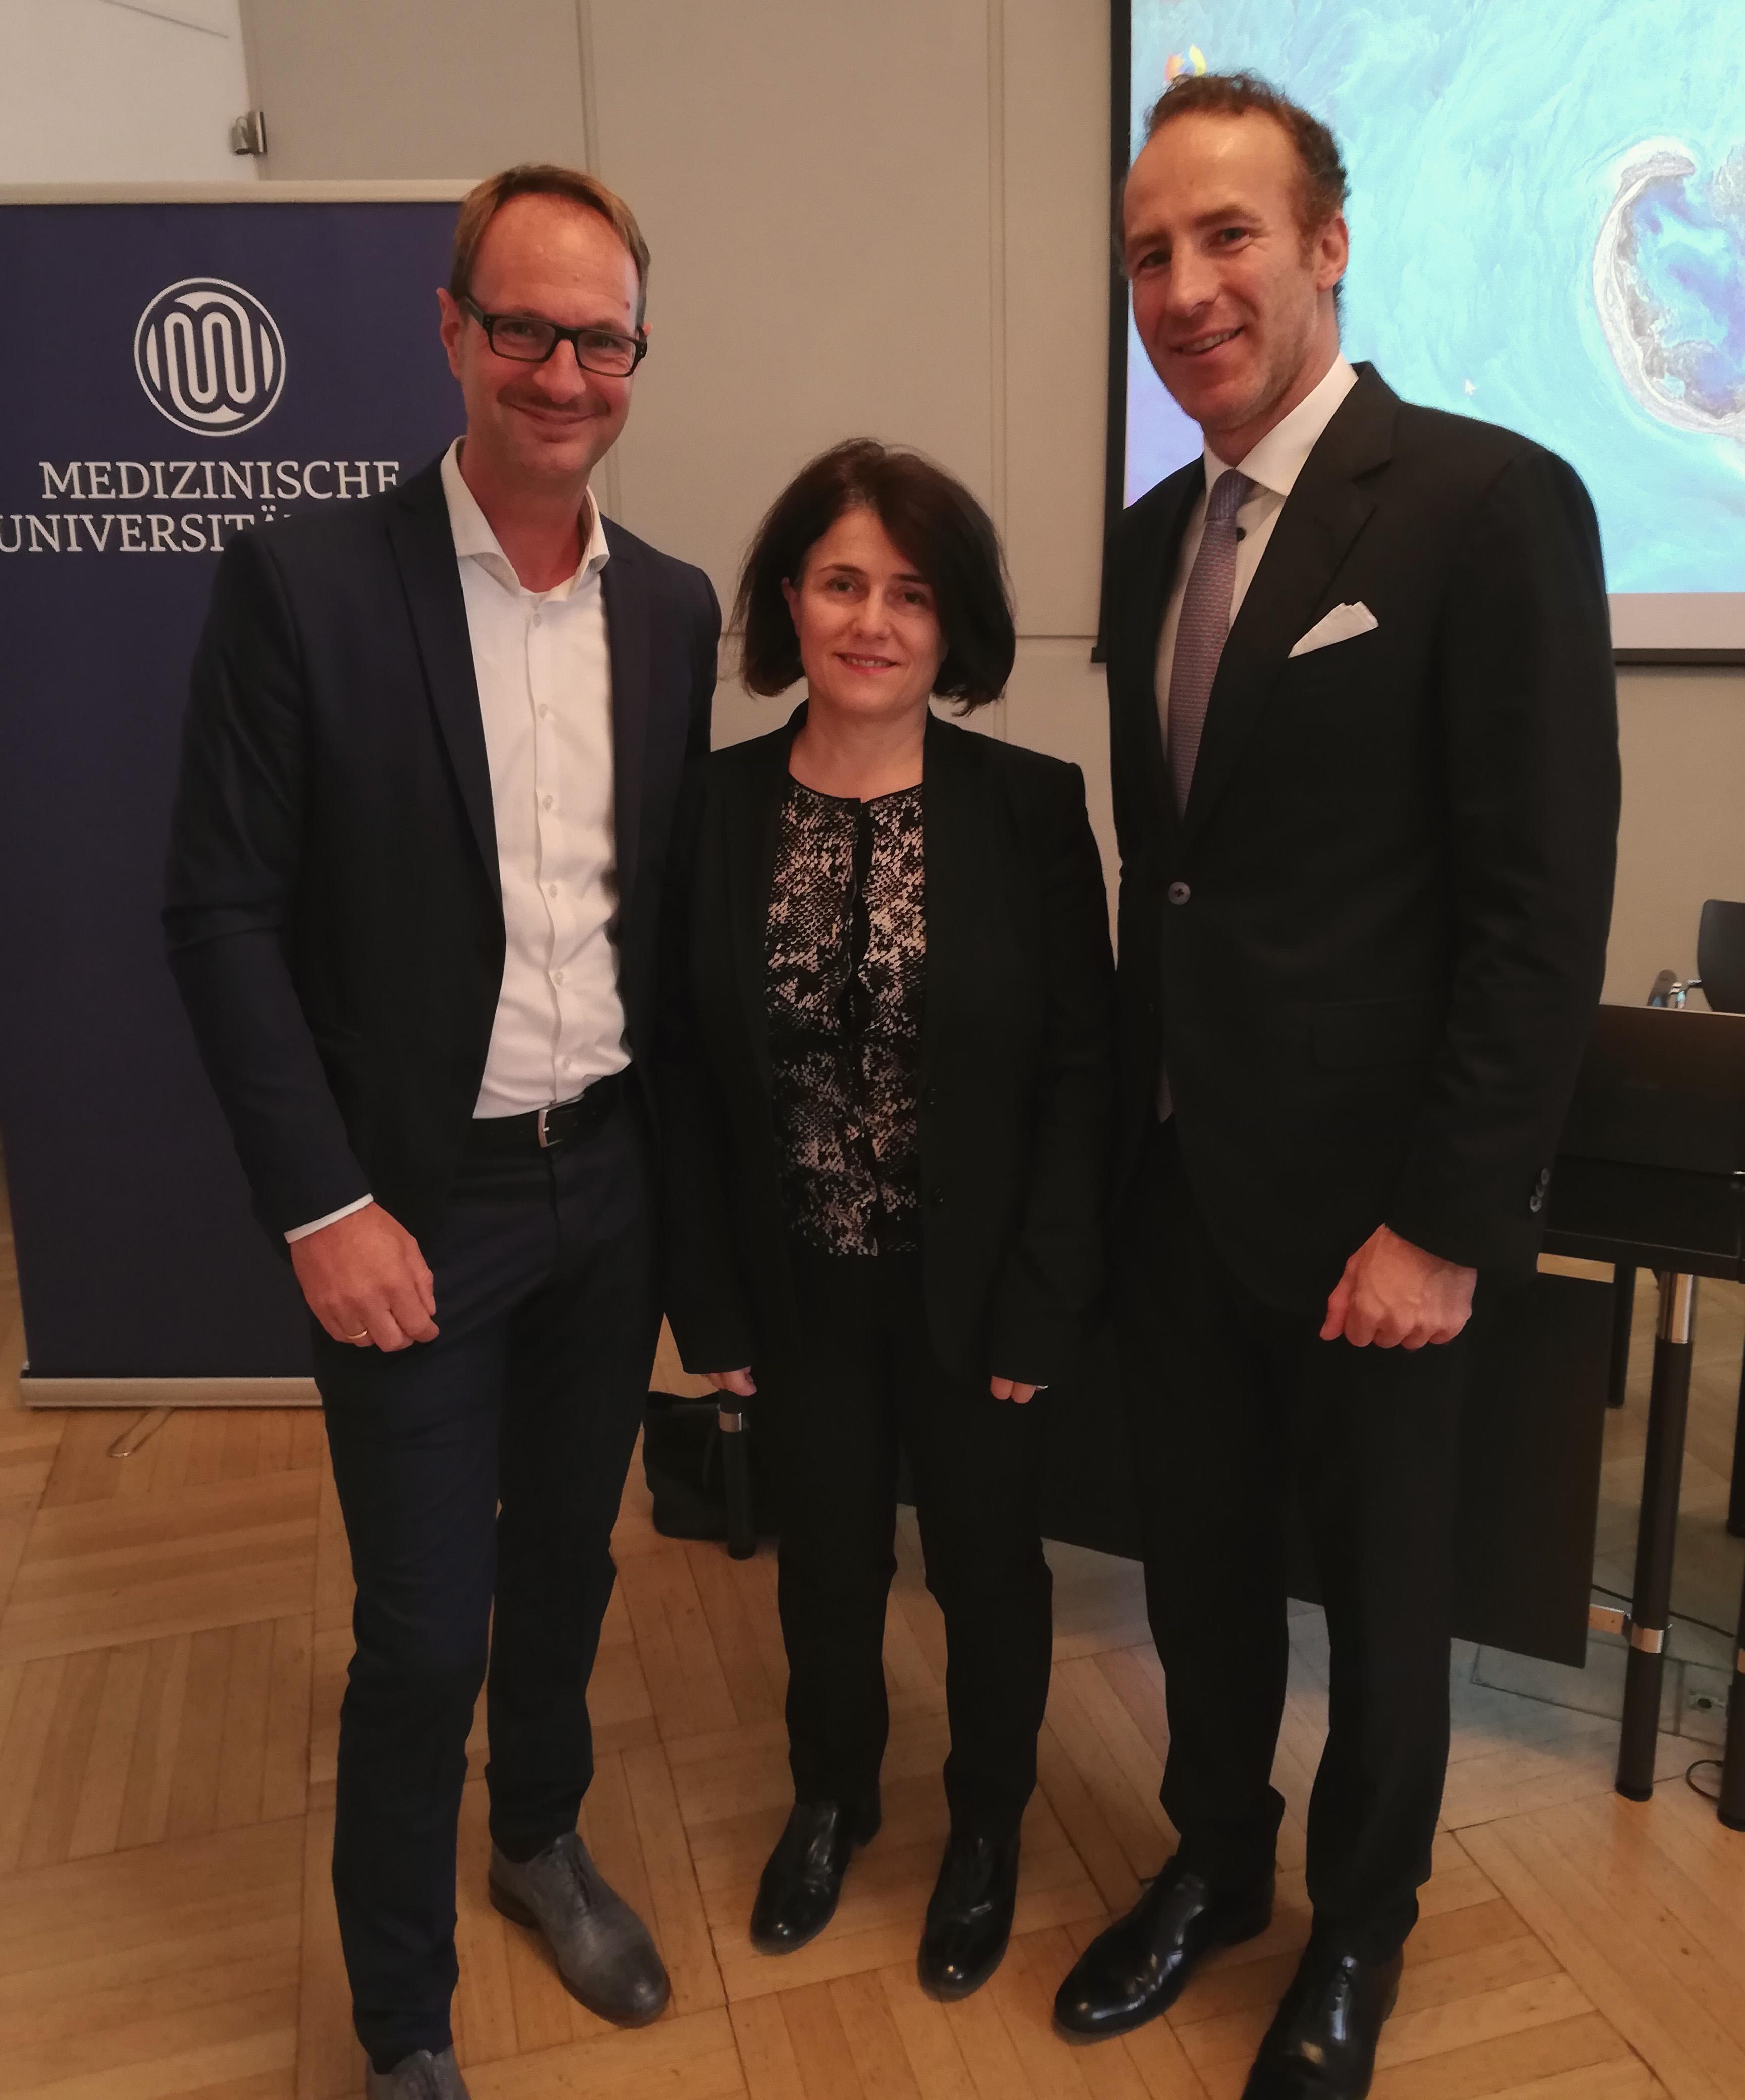 Markus Mitterhauser, Maria Sibilia, Shahrokh F. Shariat